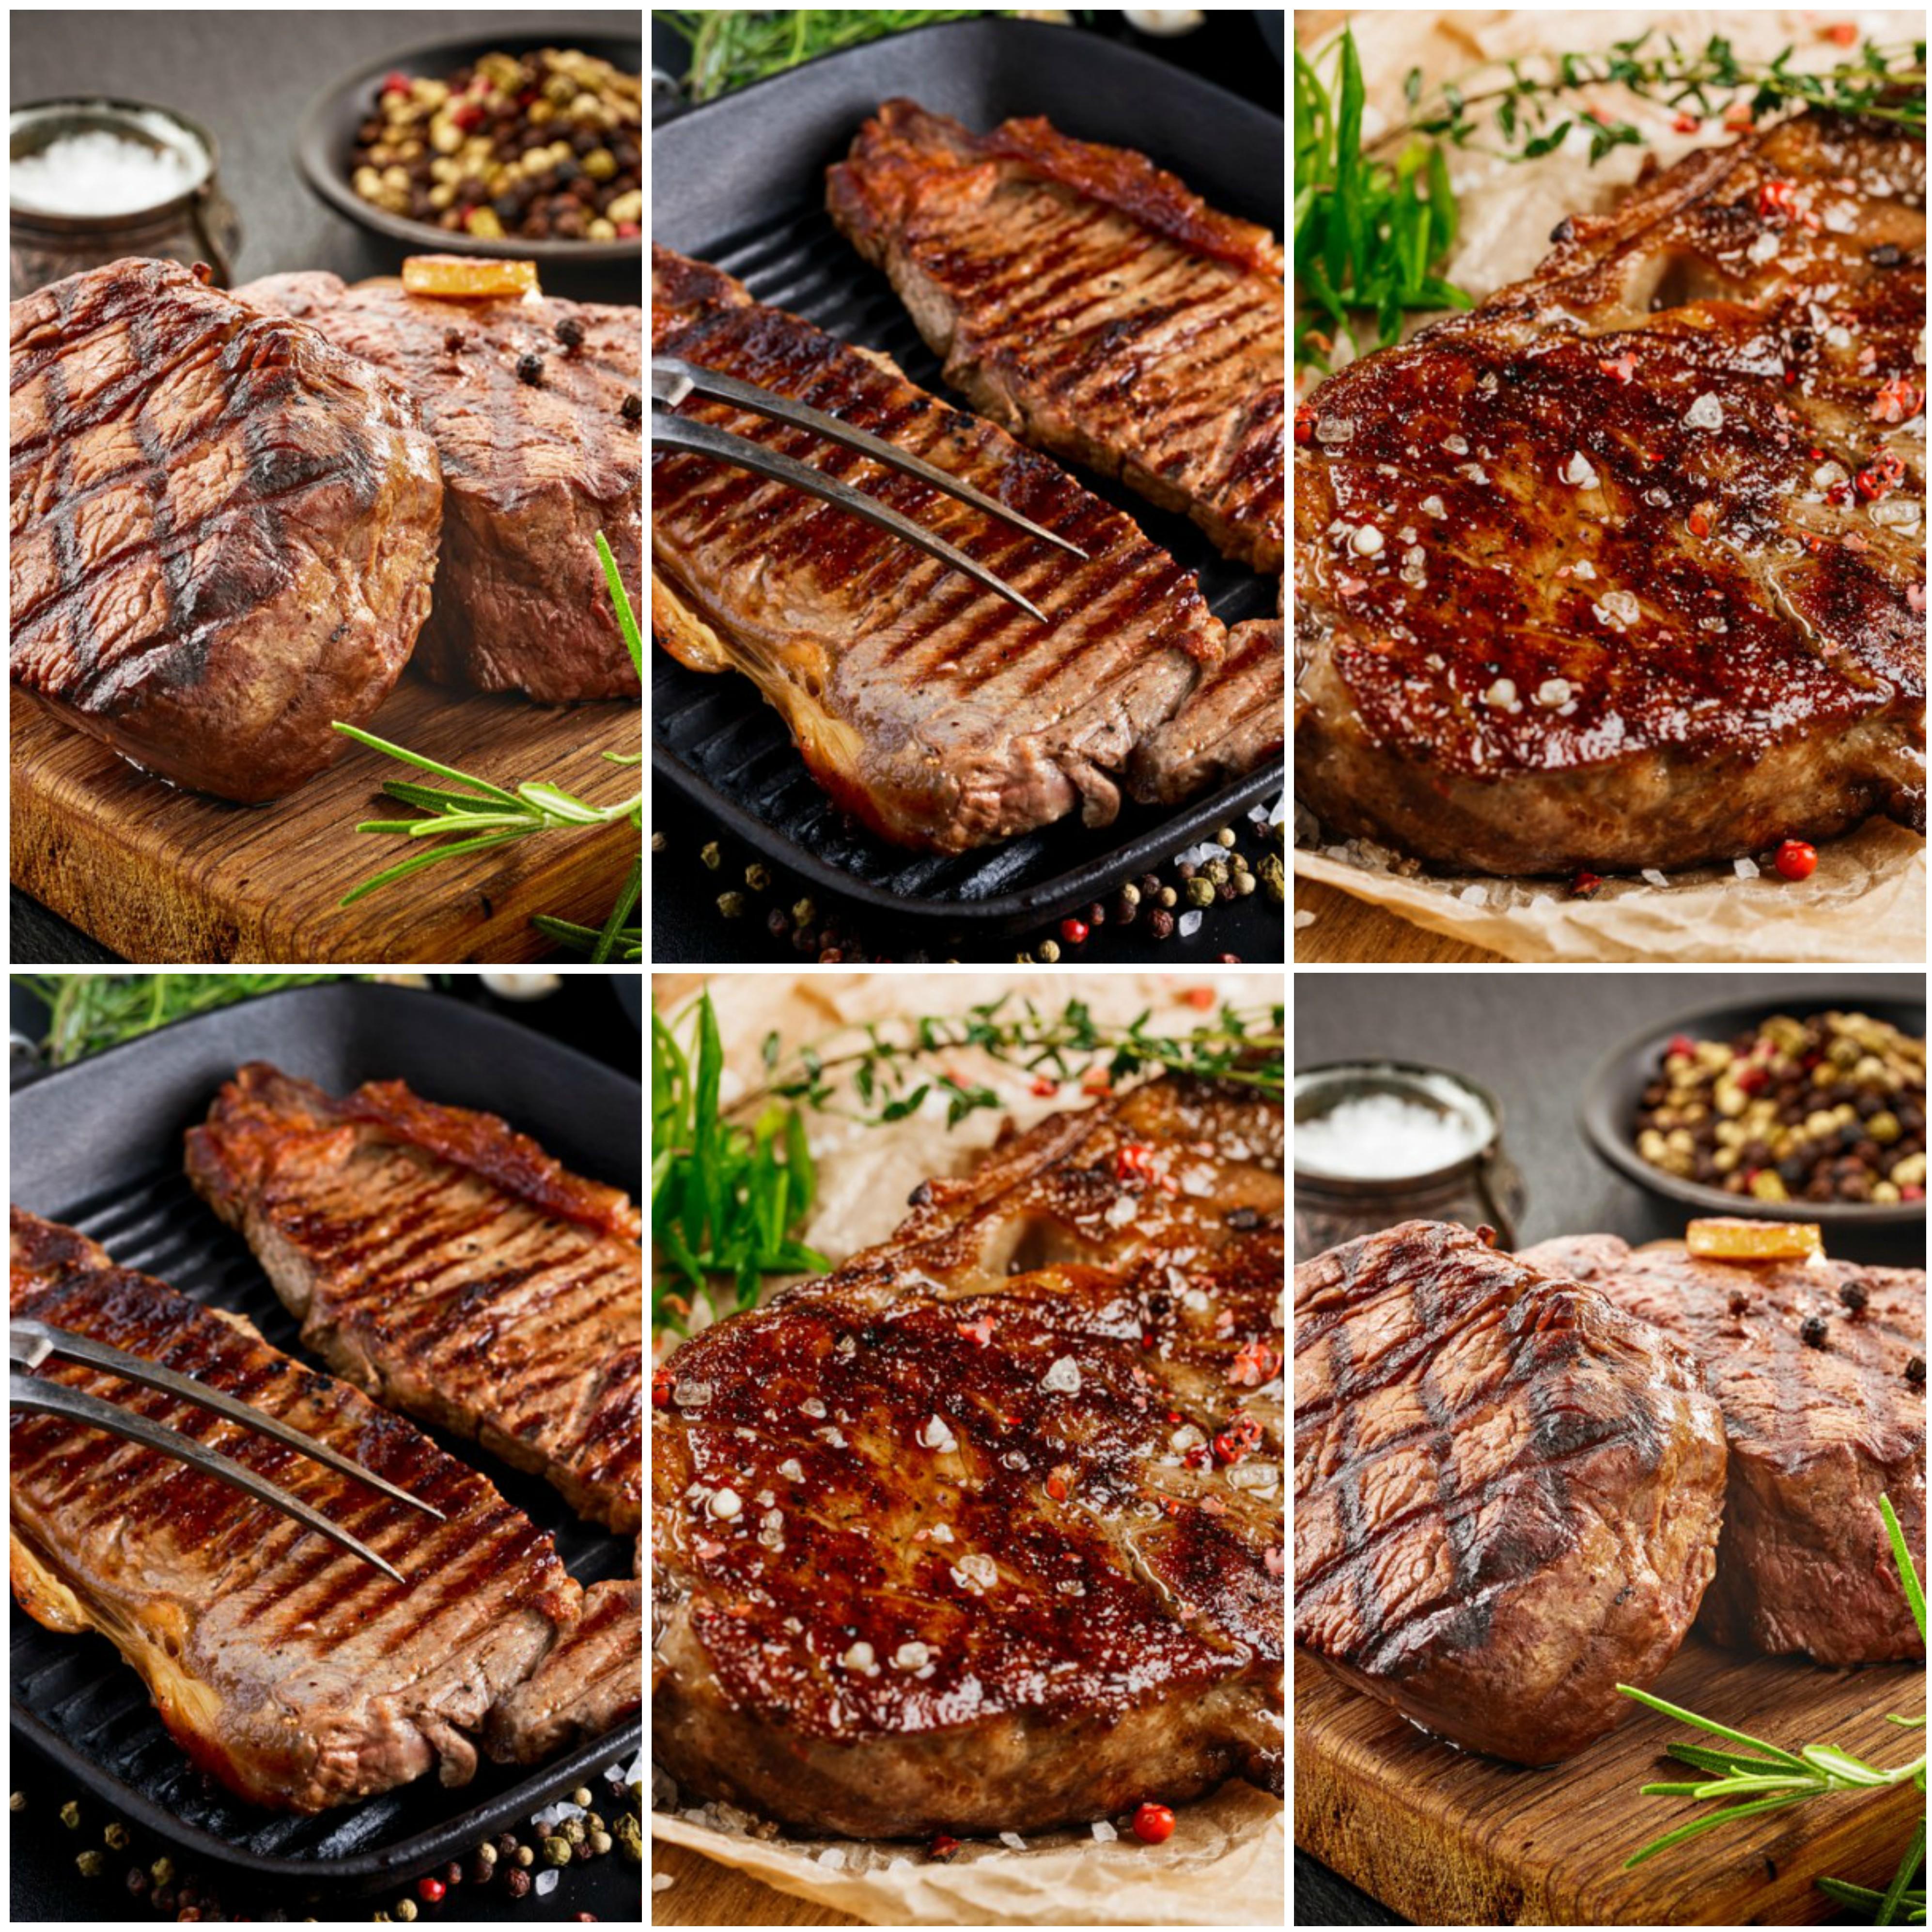 Big Galloway Steak Box The Blackface Meat Company